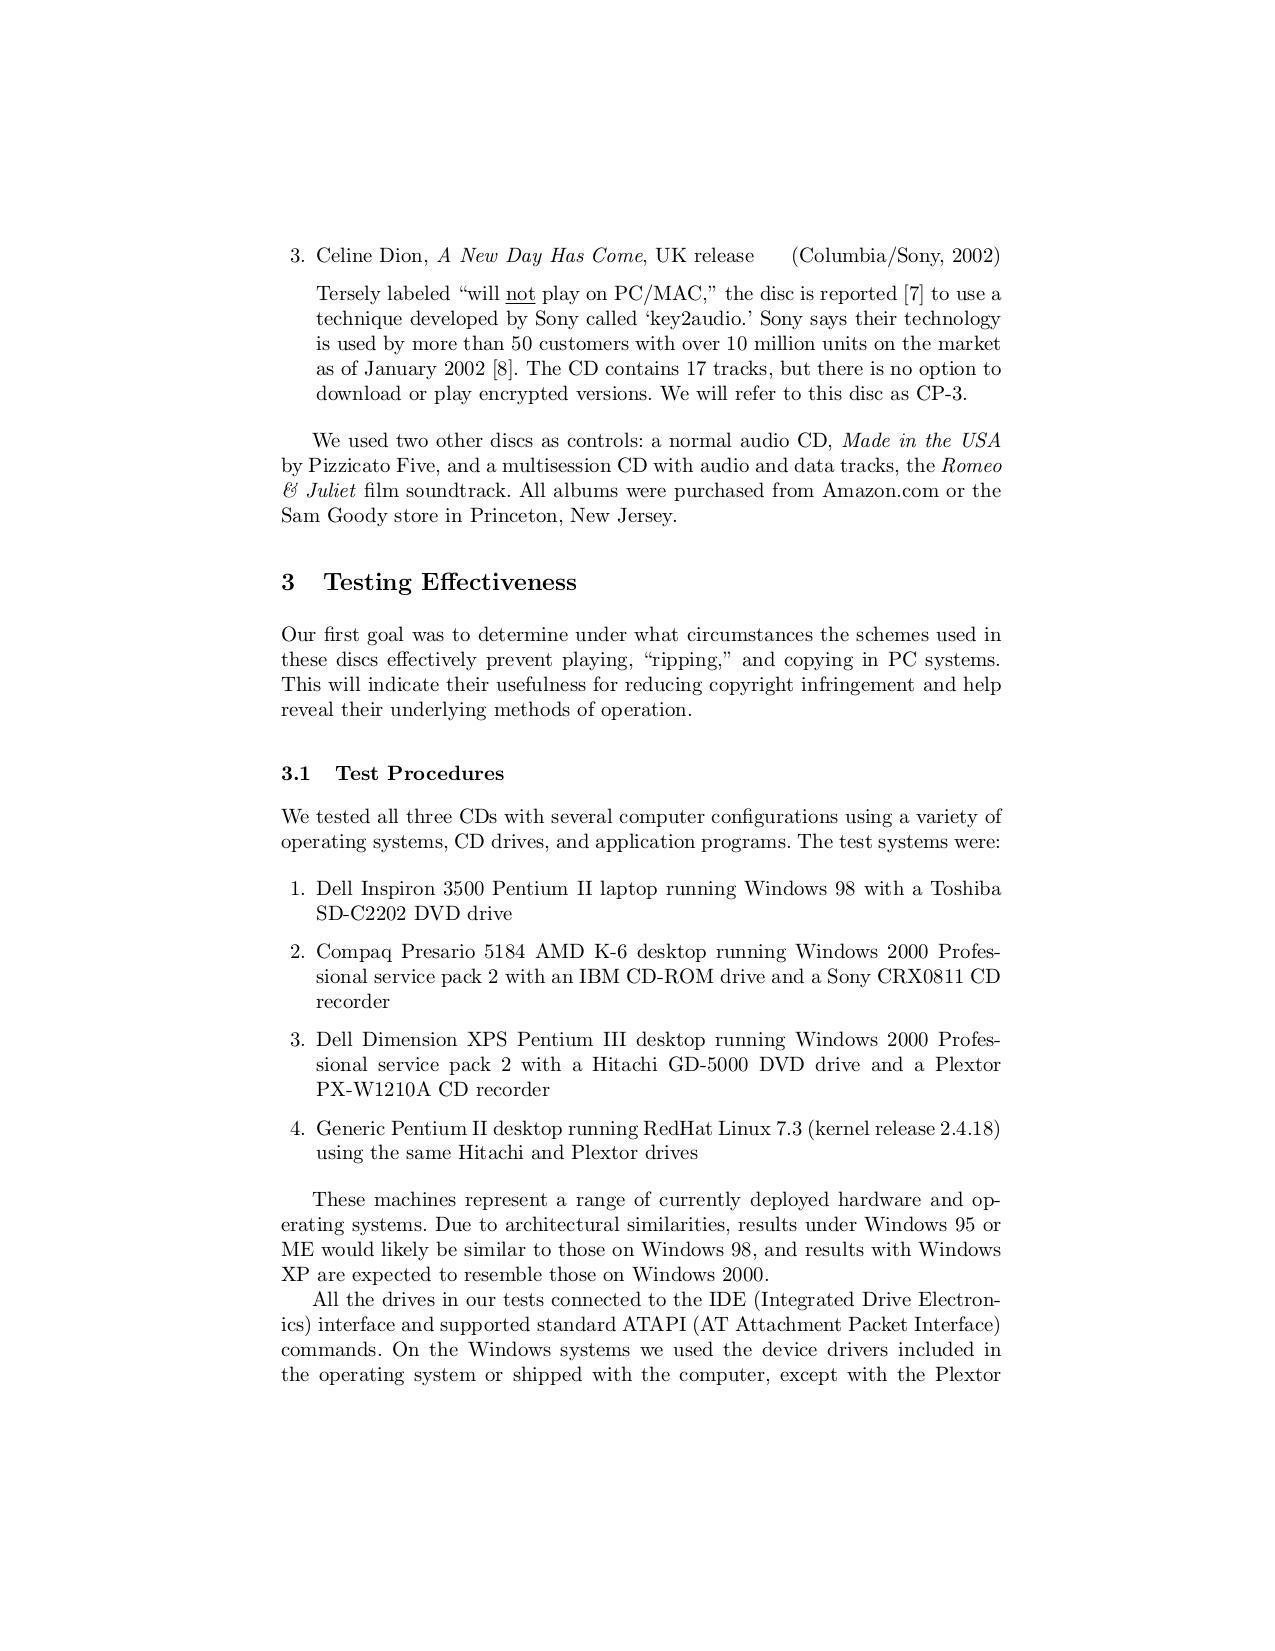 PDF manual for Panasonic CD Player SL-PG4